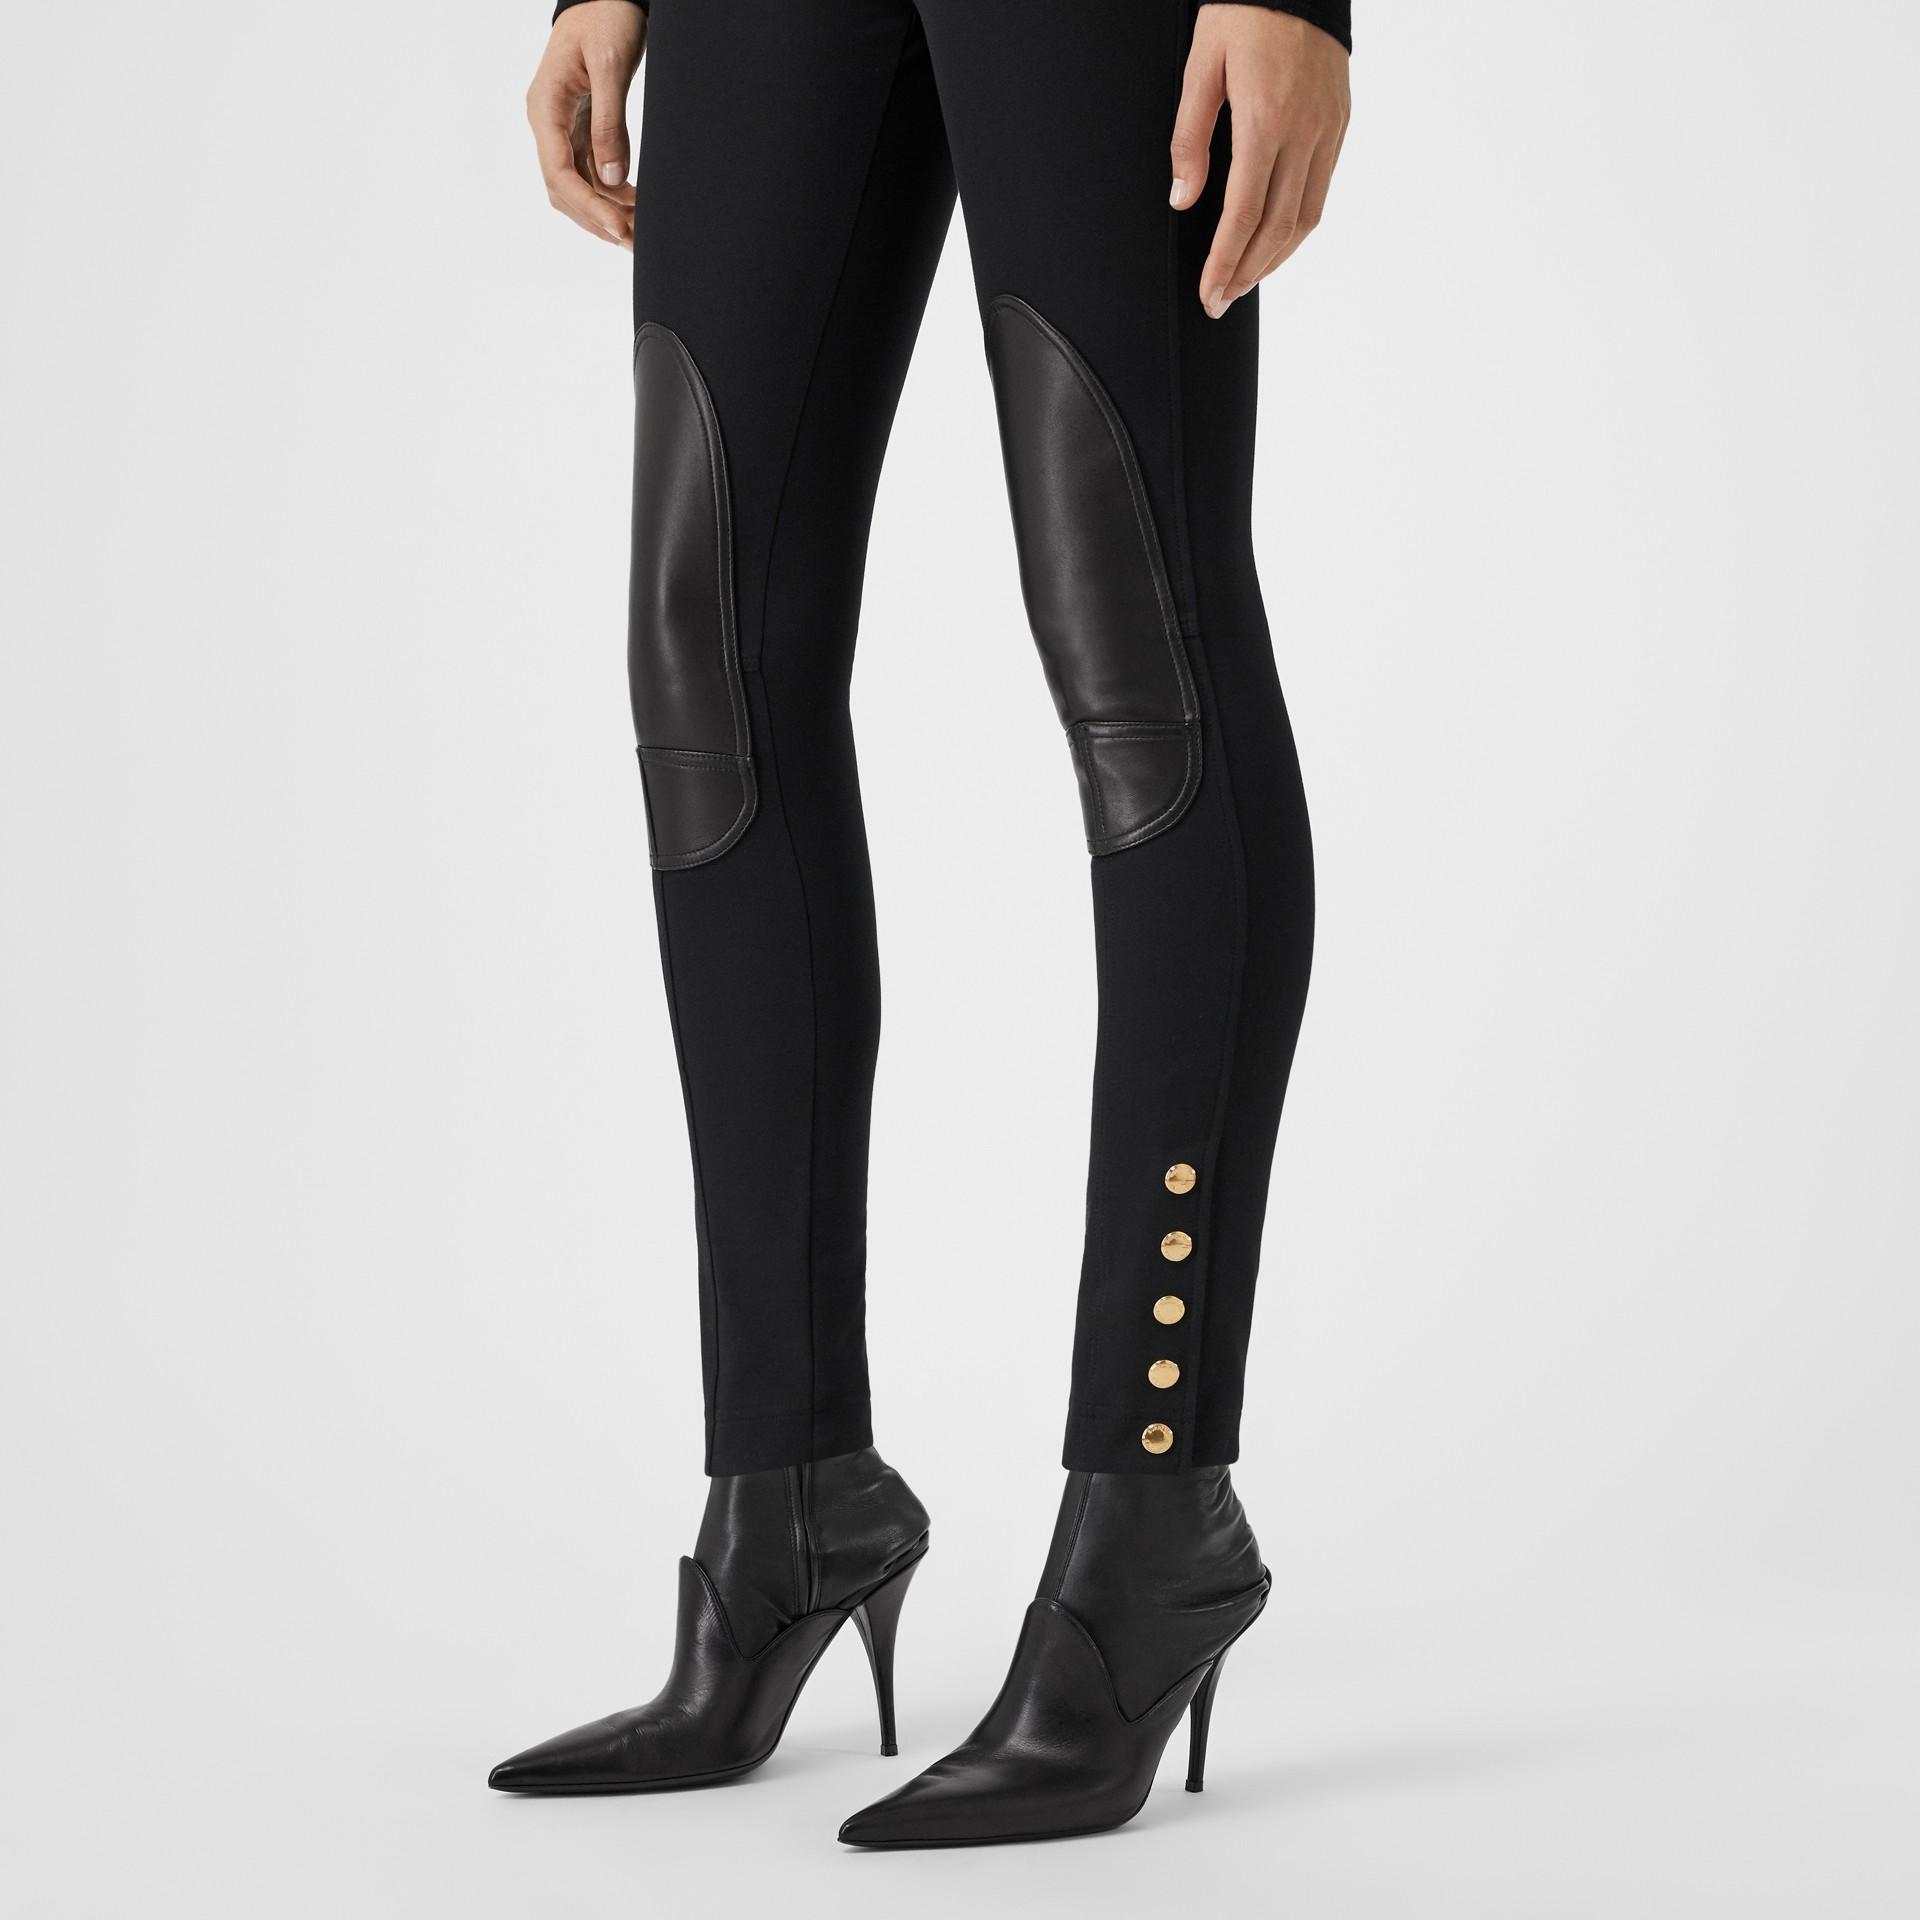 Lambskin Trim Stretch Cotton Blend Trousers in Black - Women | Burberry United Kingdom - gallery image 4